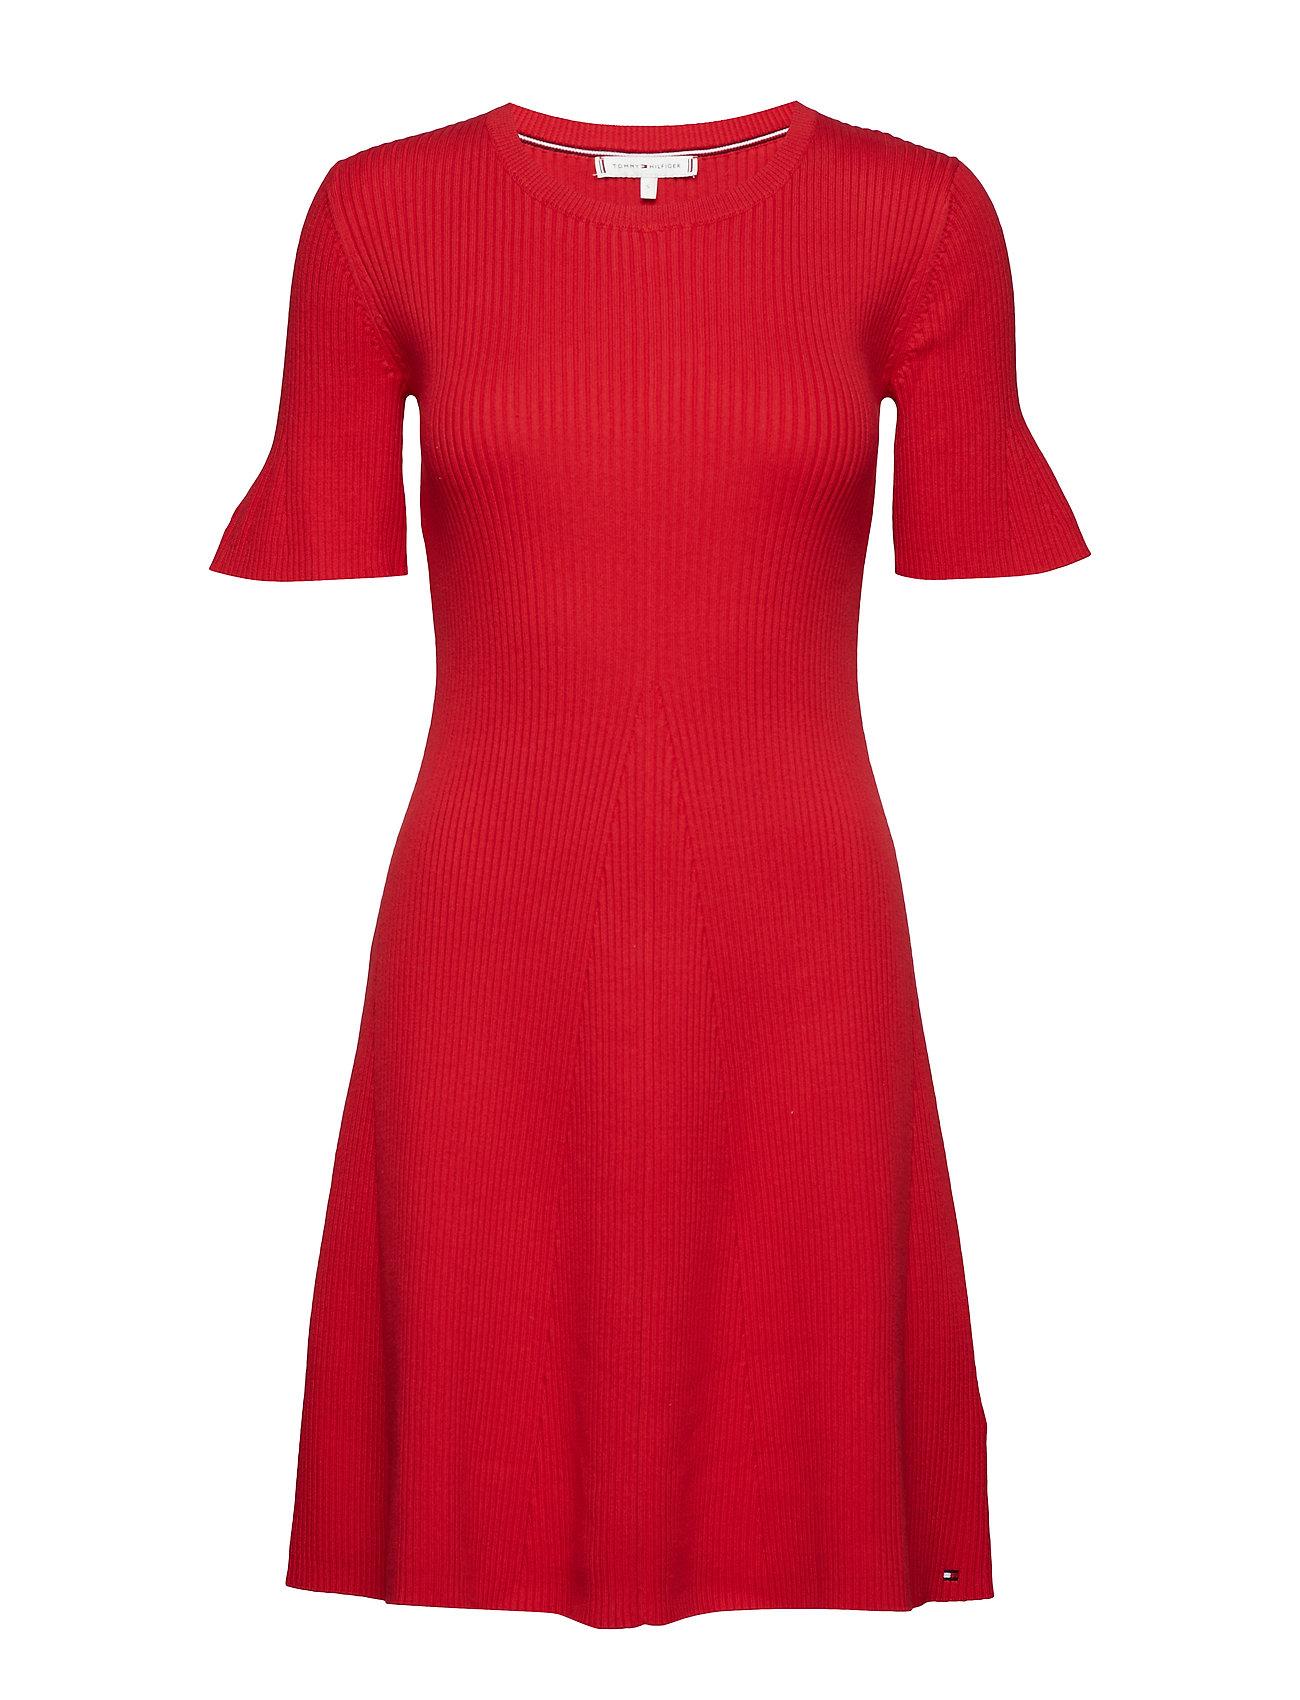 Tommy Hilfiger SANE DRESS - TRUE RED